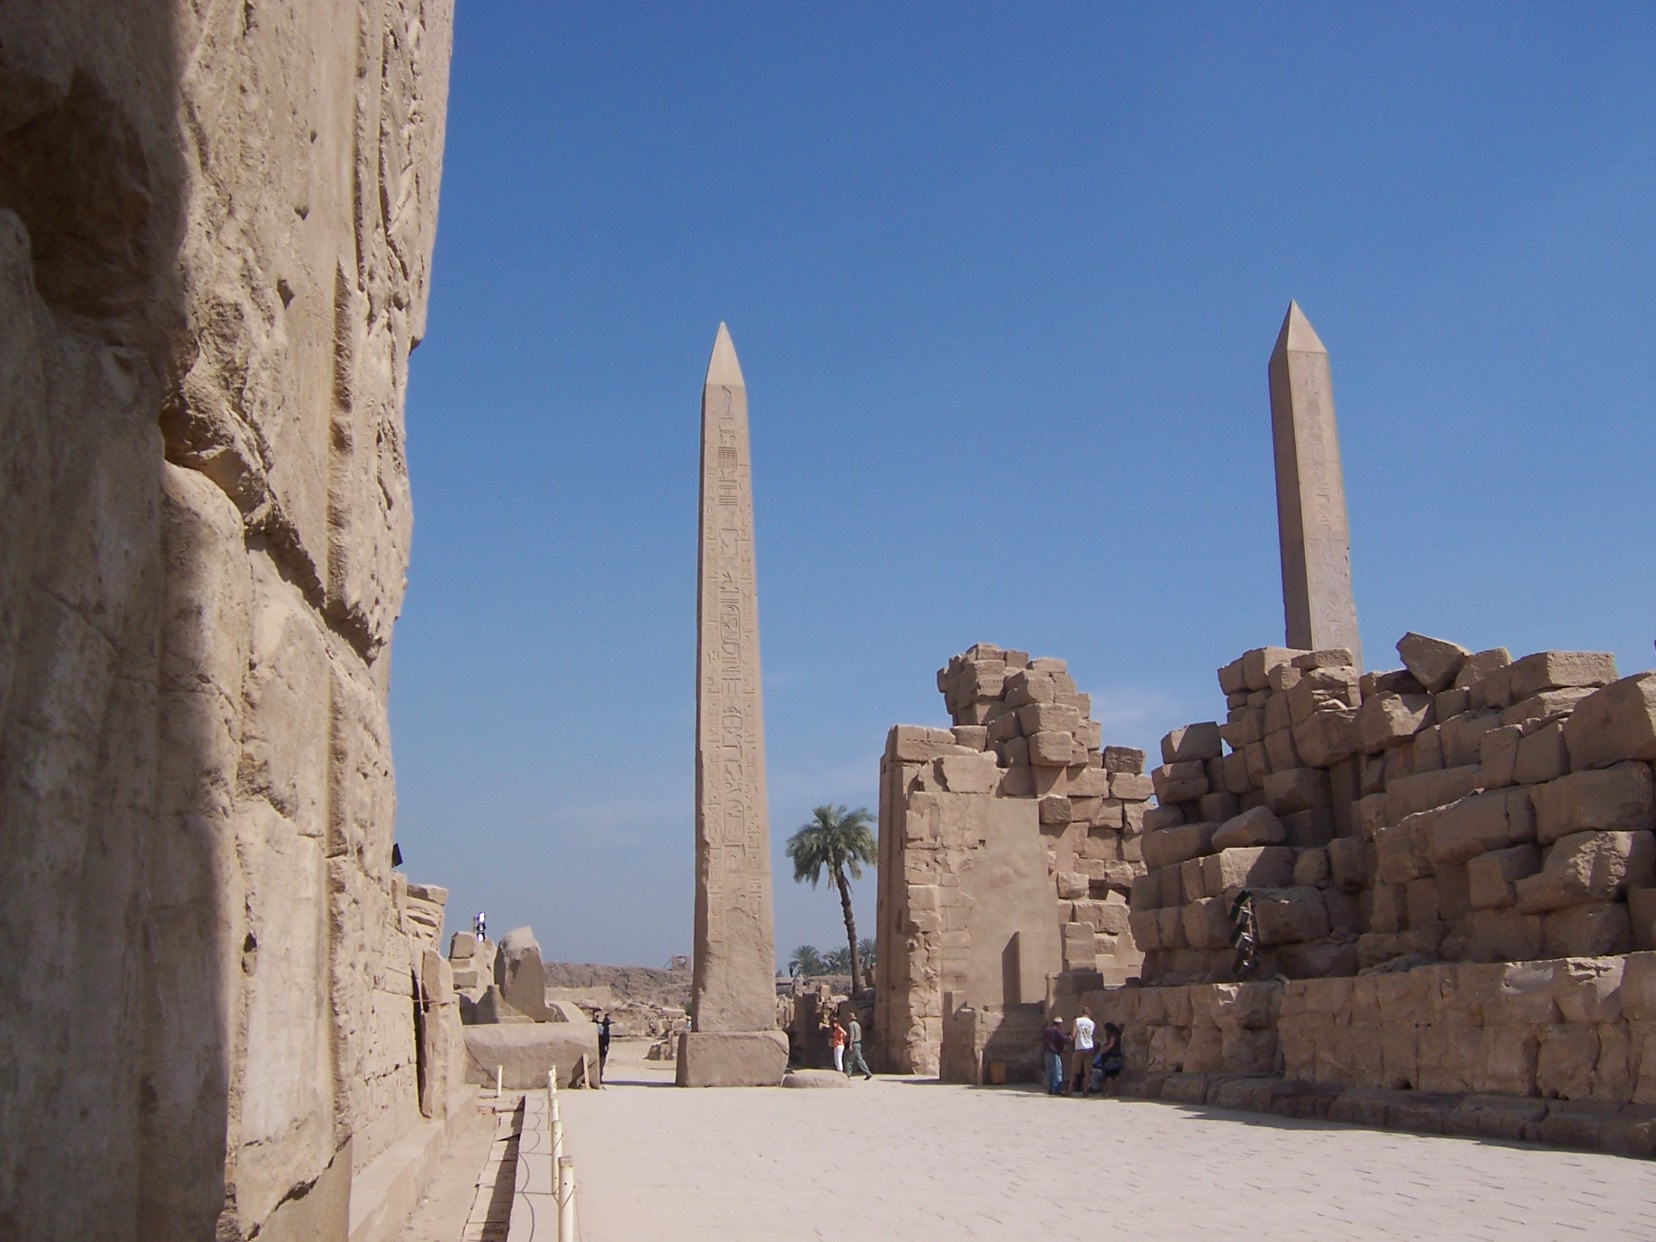 KarnakTemple@LuxorEgypt_obelisks_2007feb9-01_byDanielCsorfoly